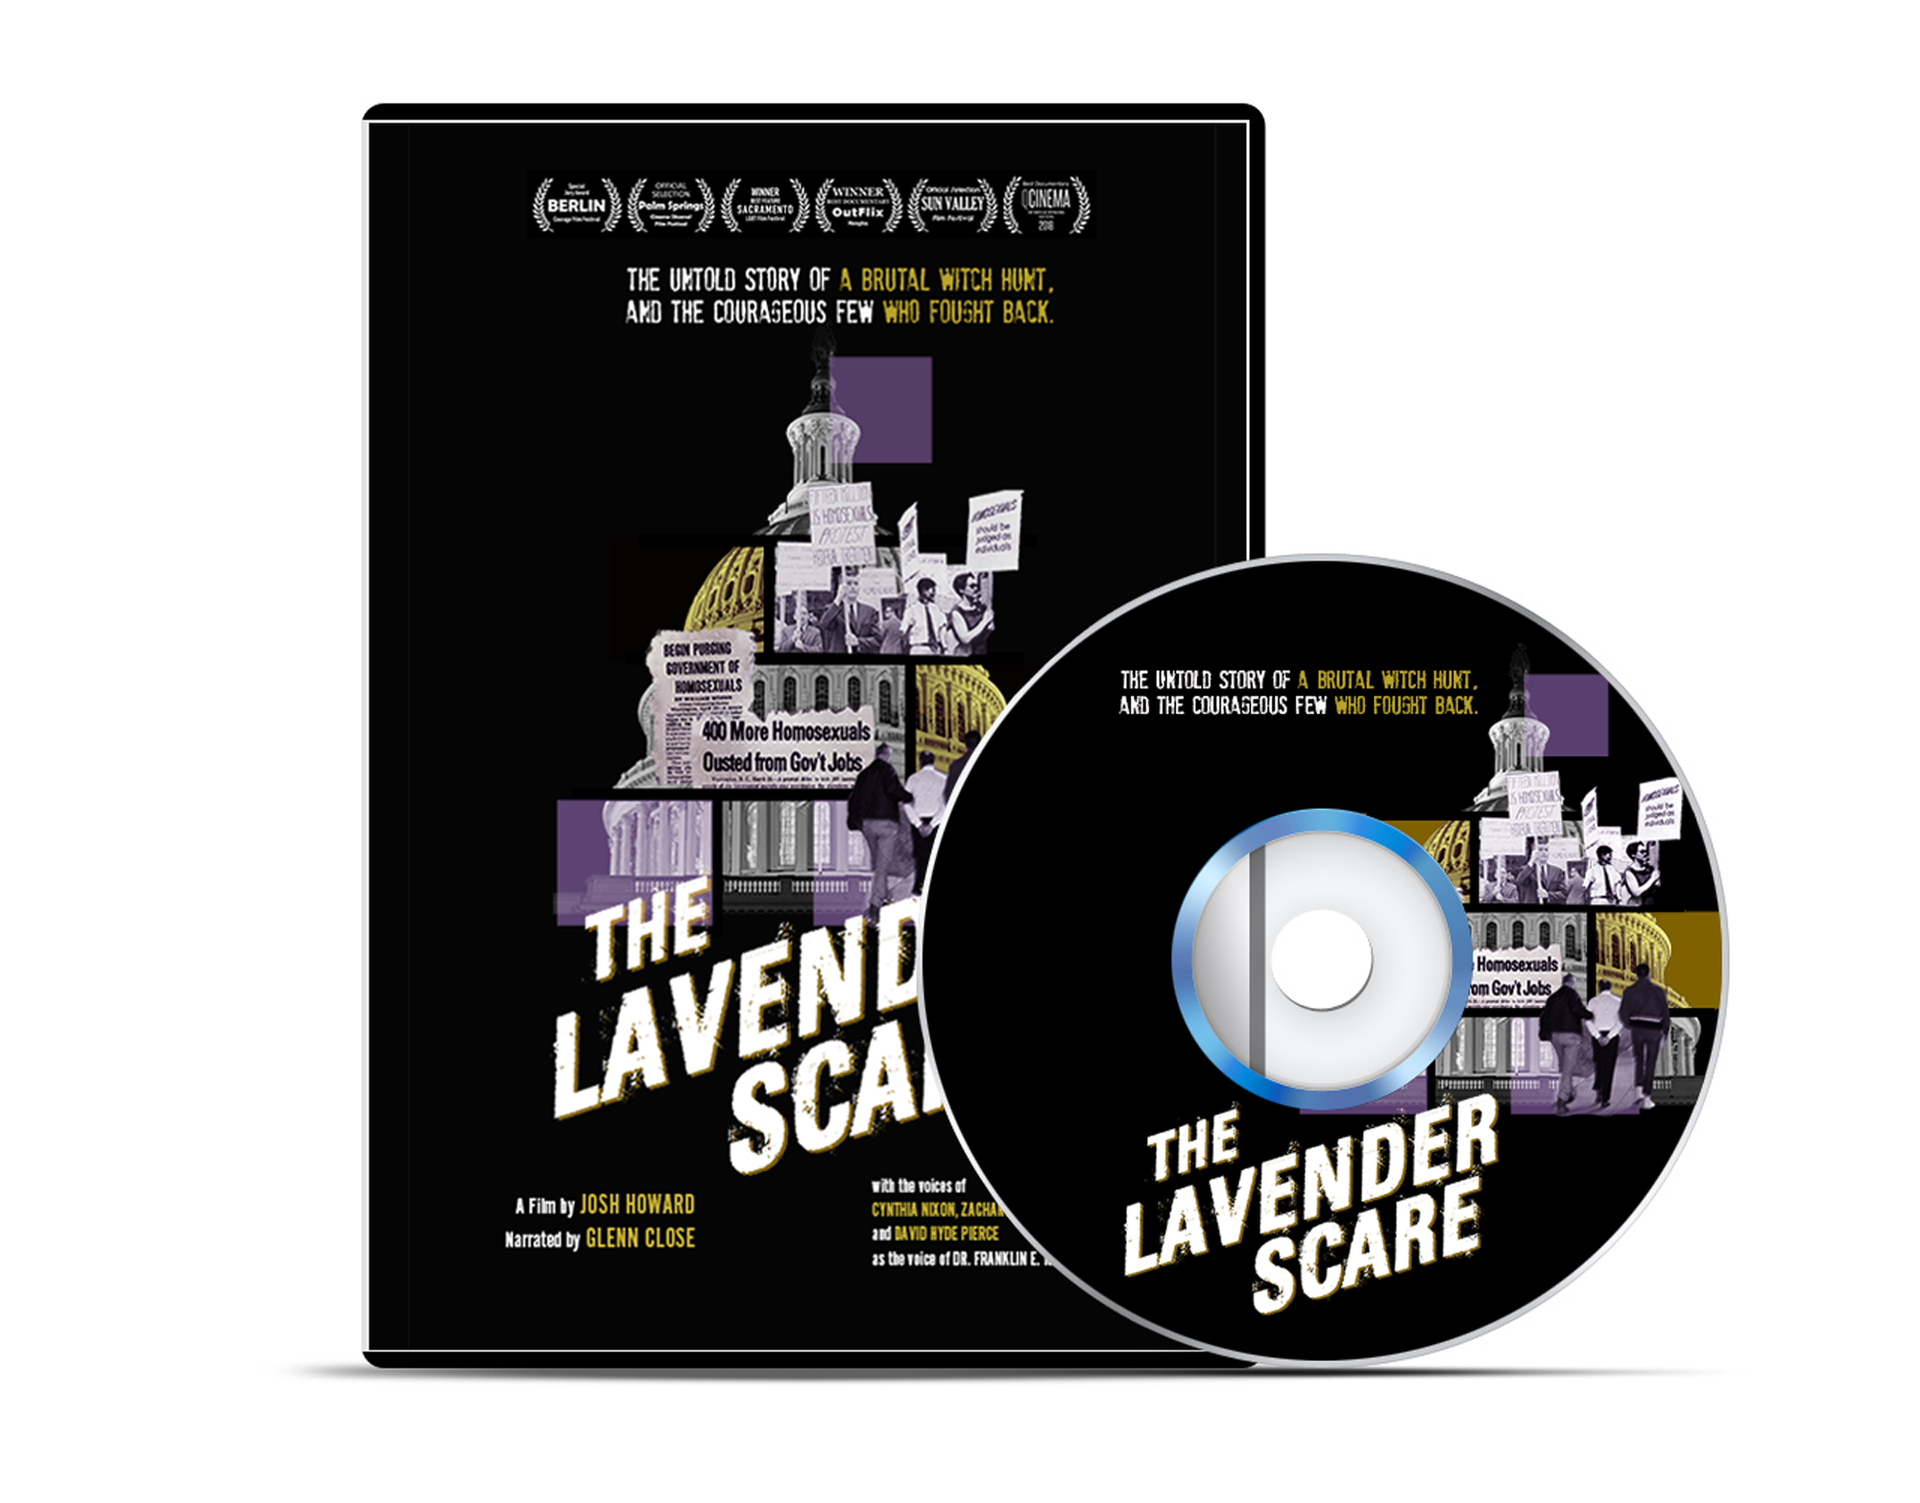 The Lavender Scare DVD/Blueray